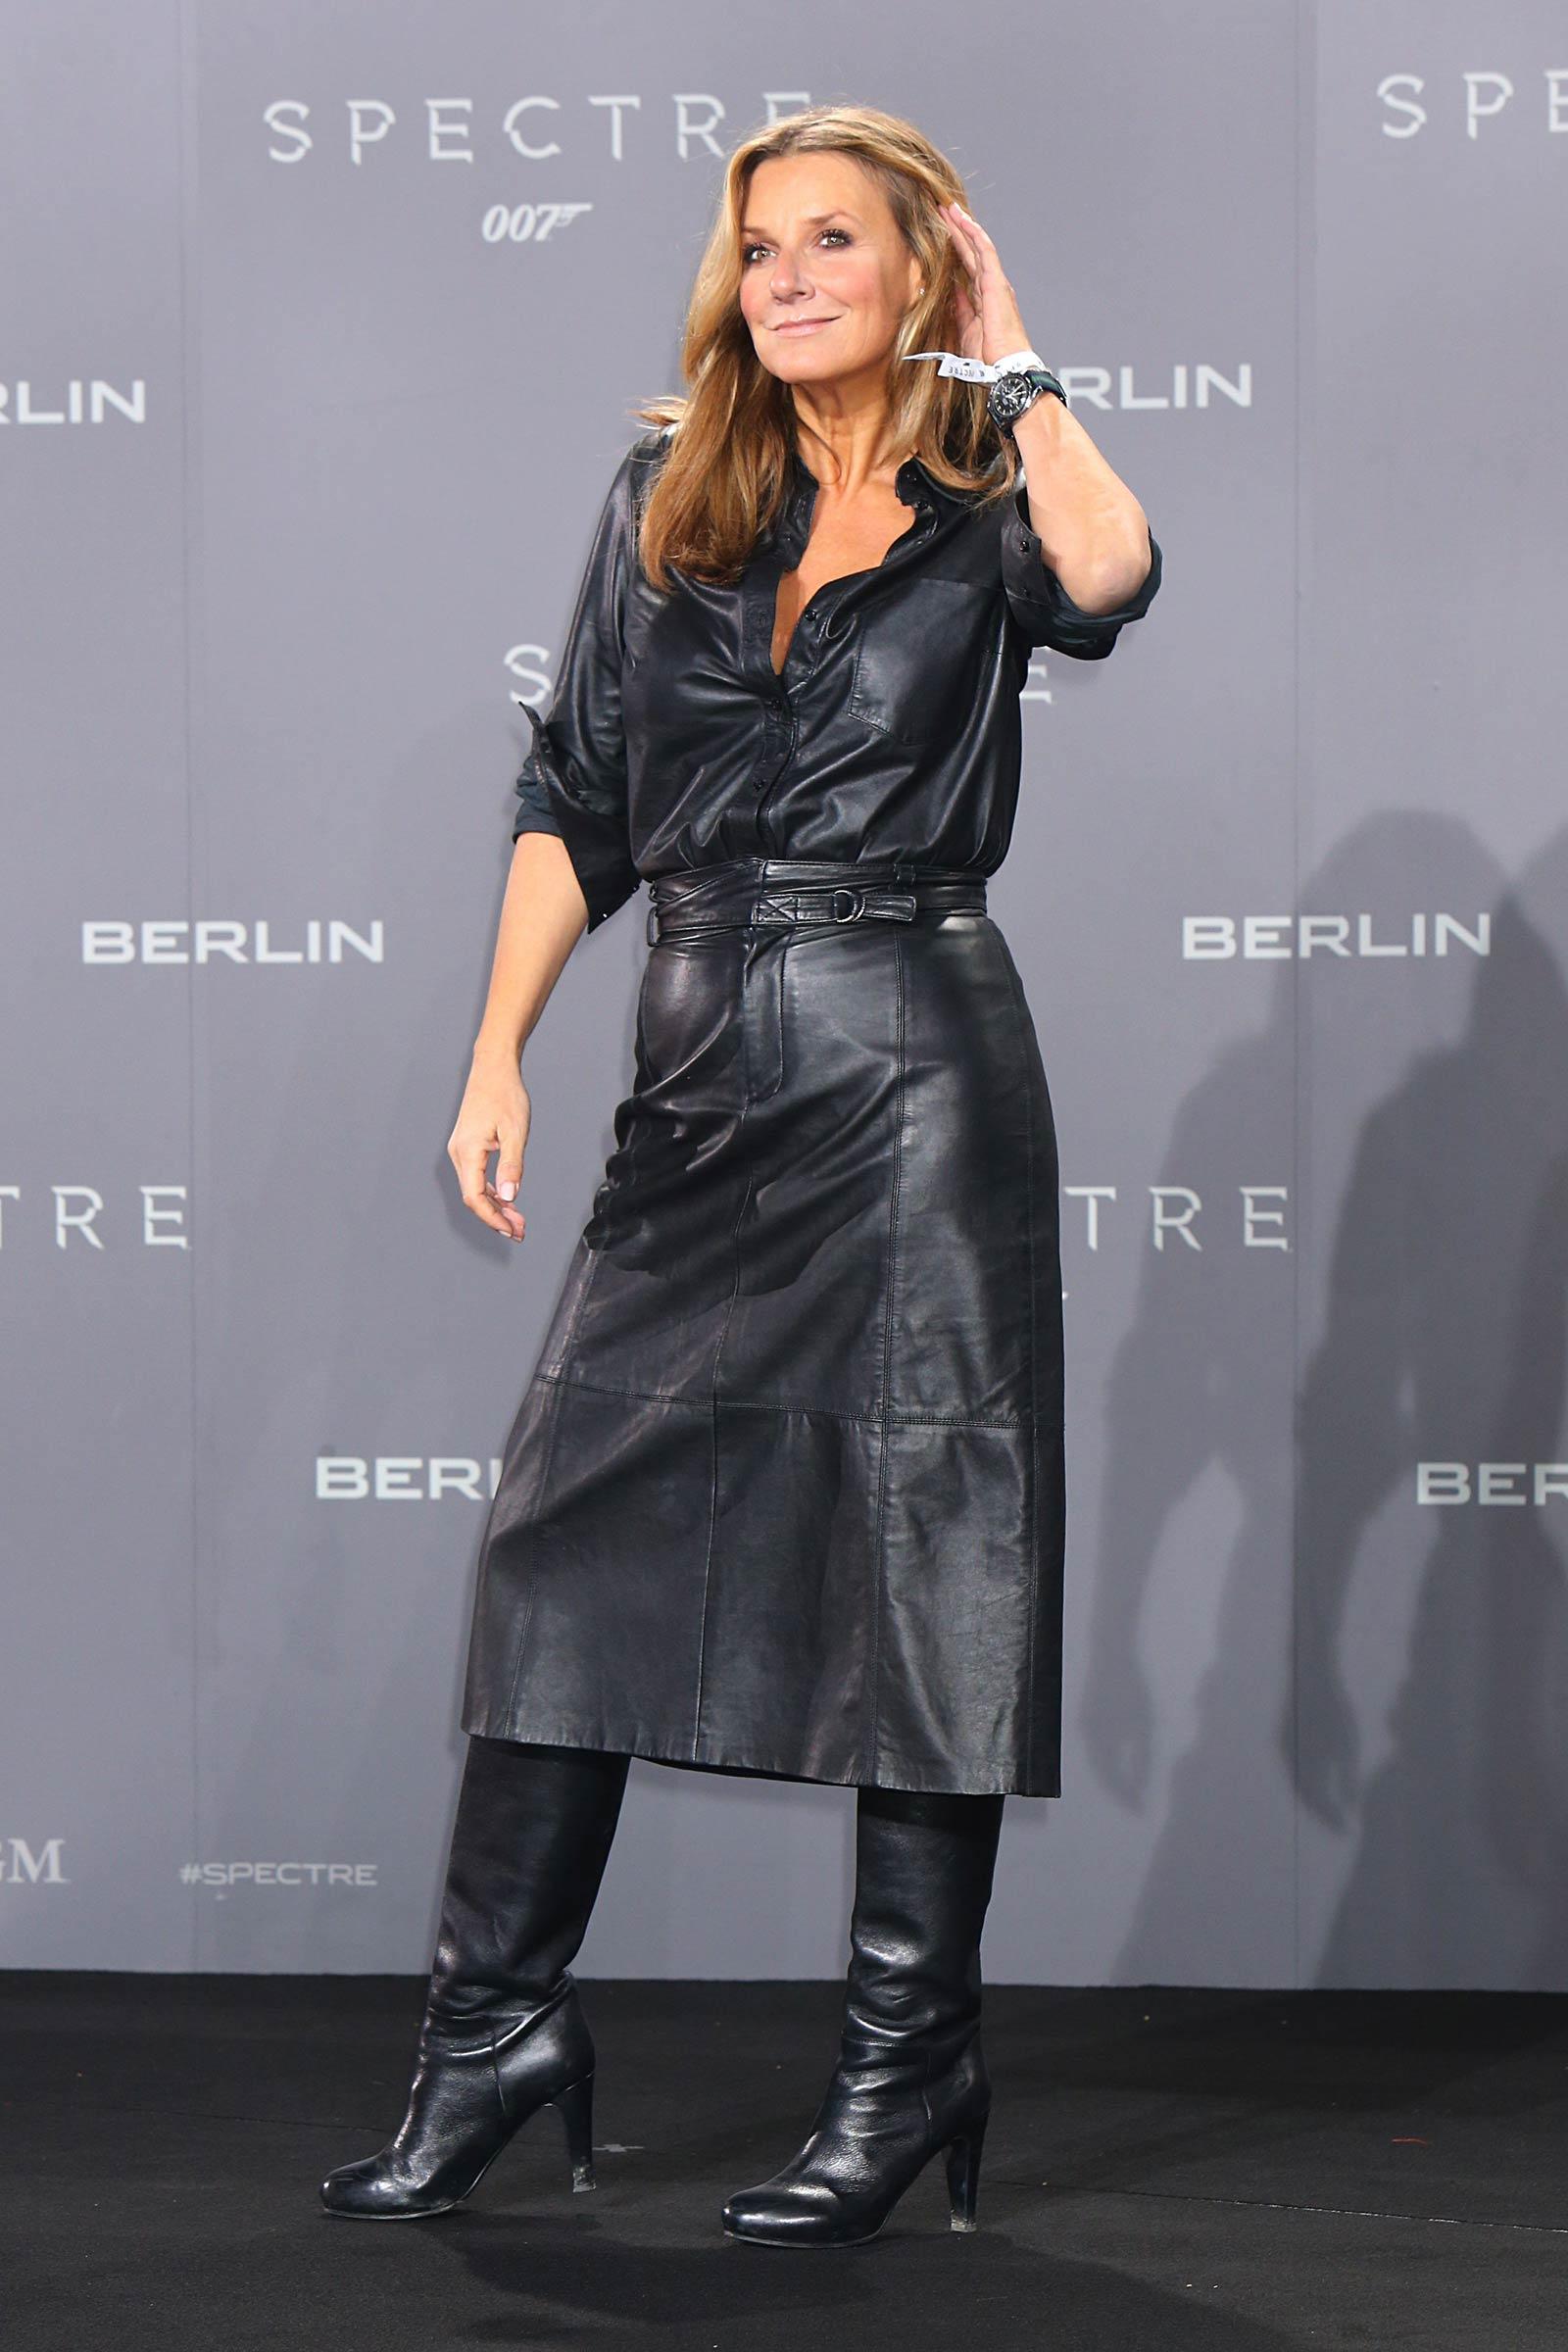 Kim Fischer attends Premiere of Spectre in Berlin